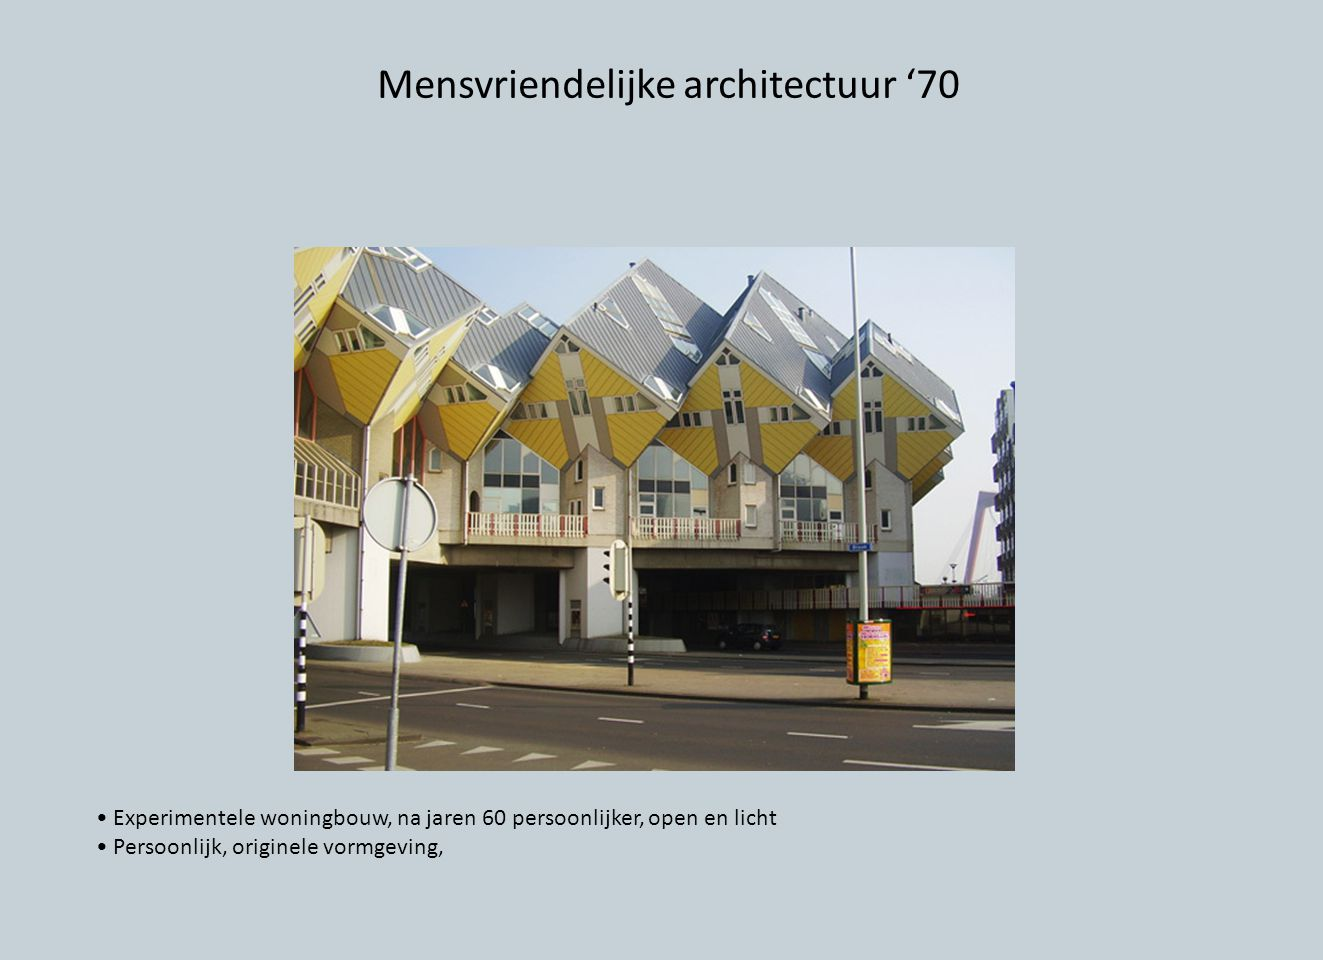 Mensvriendelijke architectuur '70